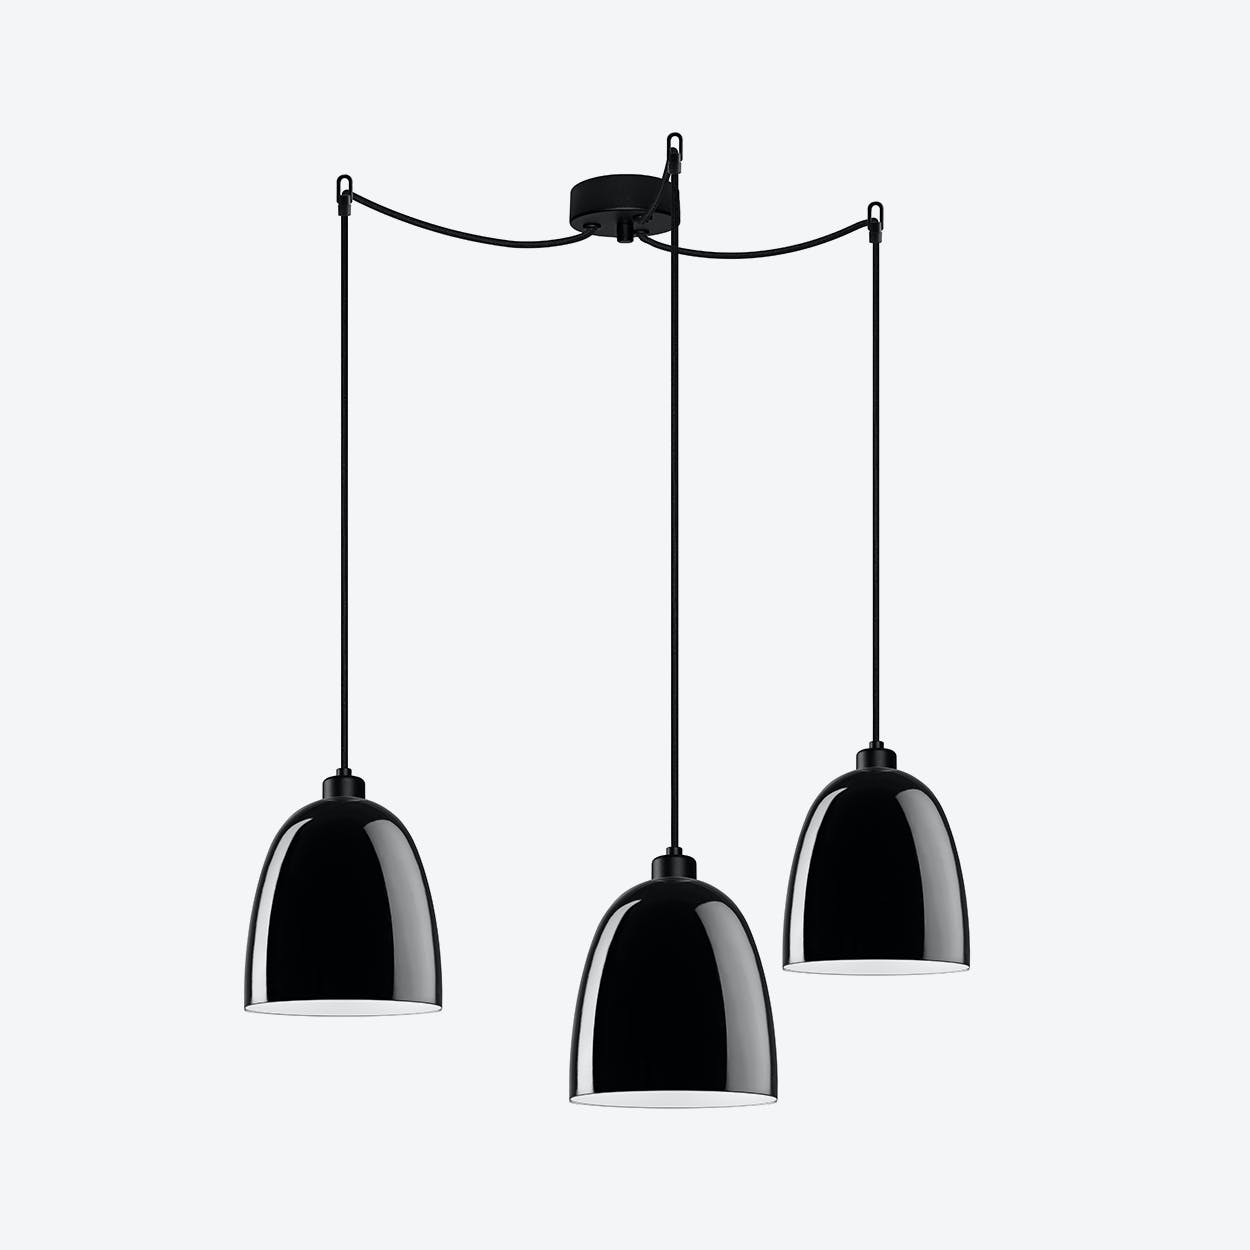 AWA Triple Pendant Light in Glossy Black